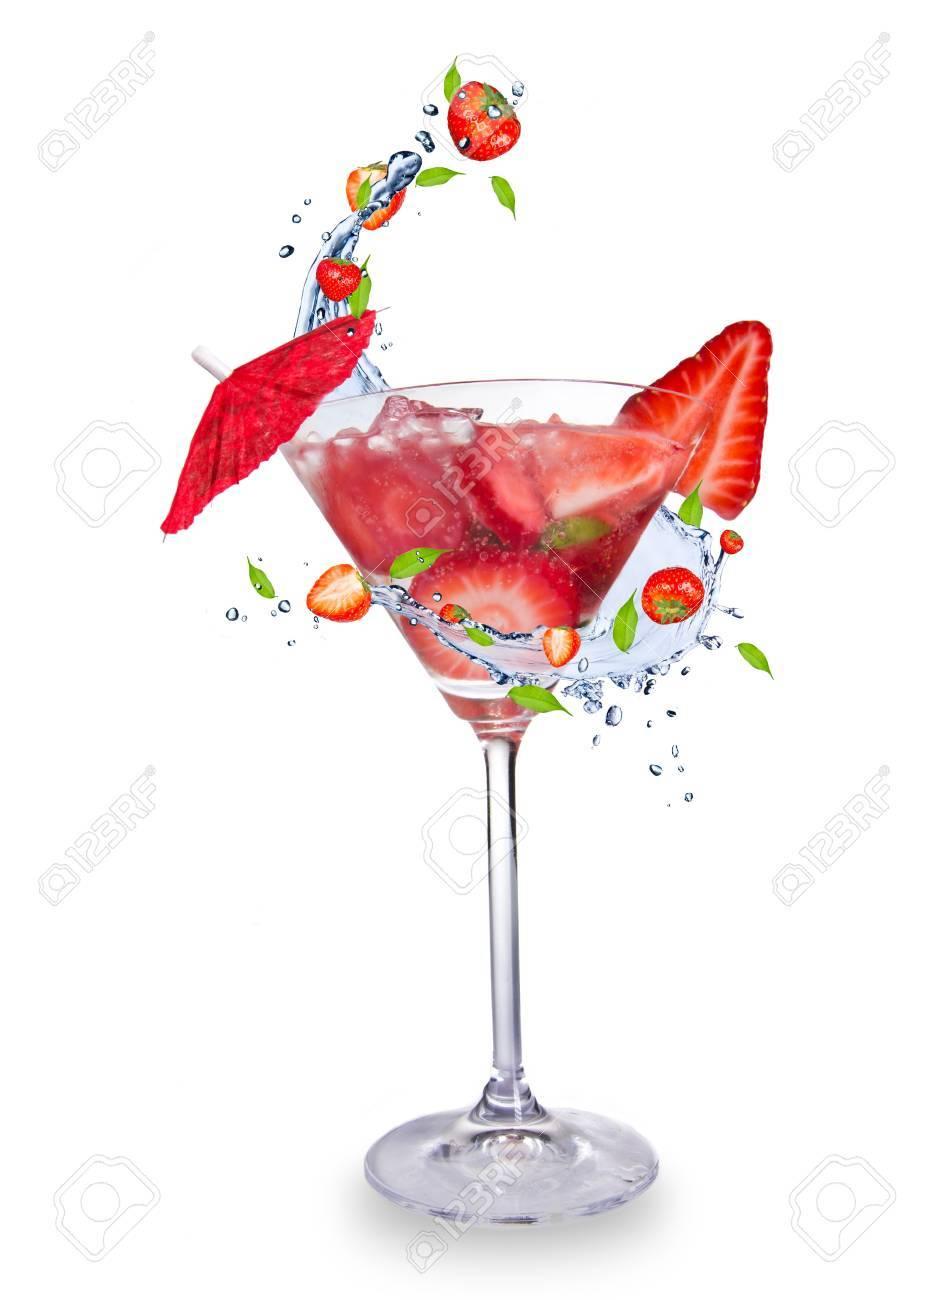 Strawberry mojito drink with splash, isolated on white background Stock Photo - 13552023